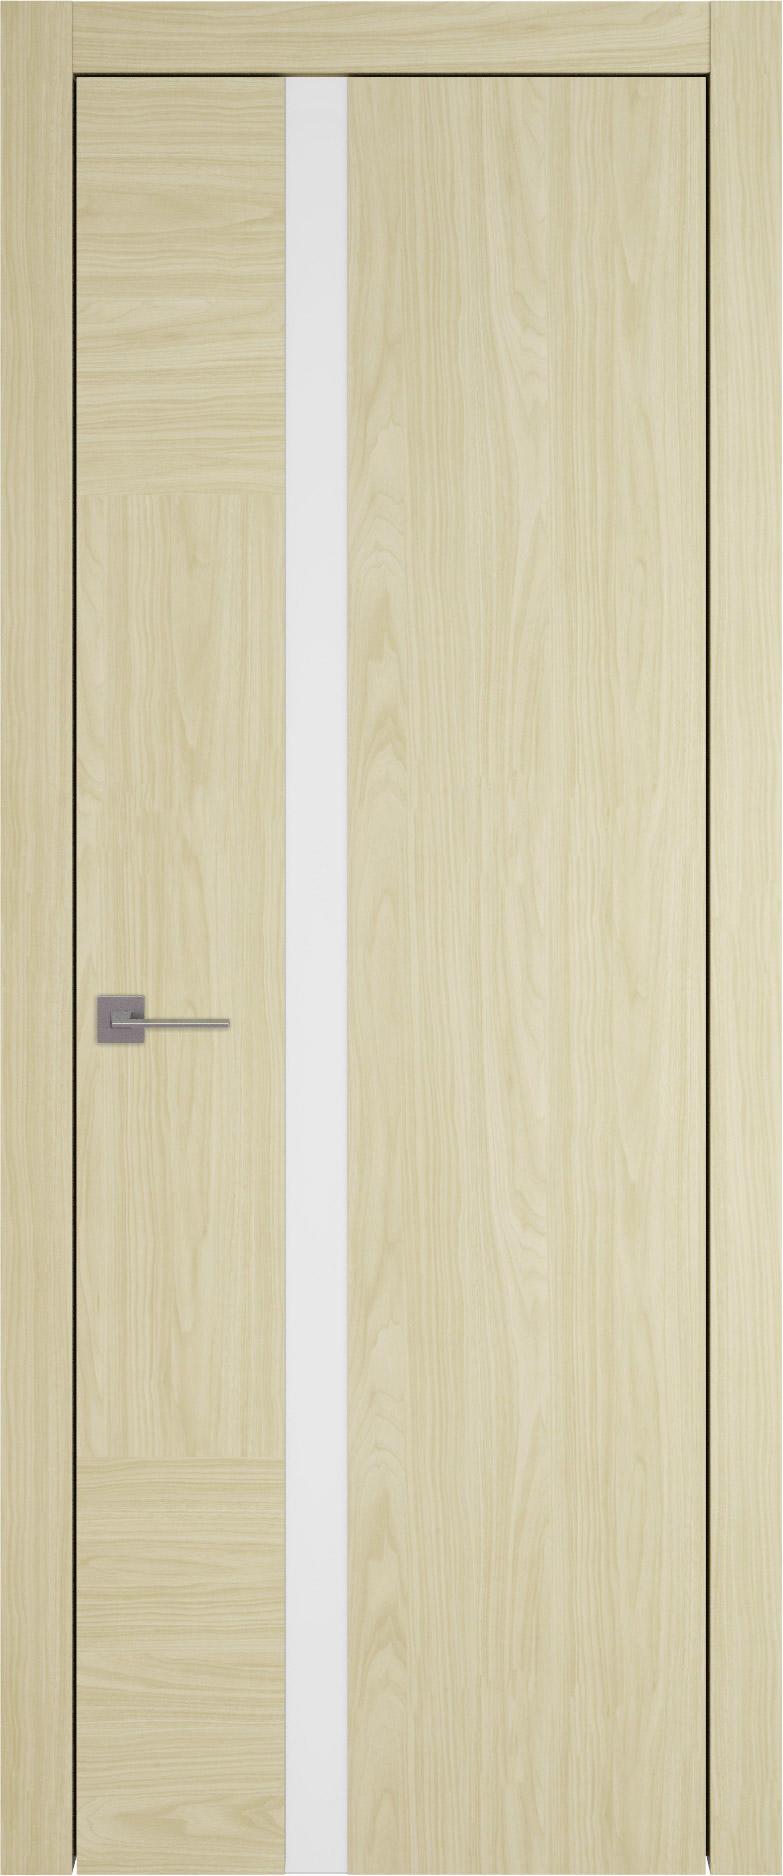 Tivoli Д-1 цвет - Дуб нордик Без стекла (ДГ)